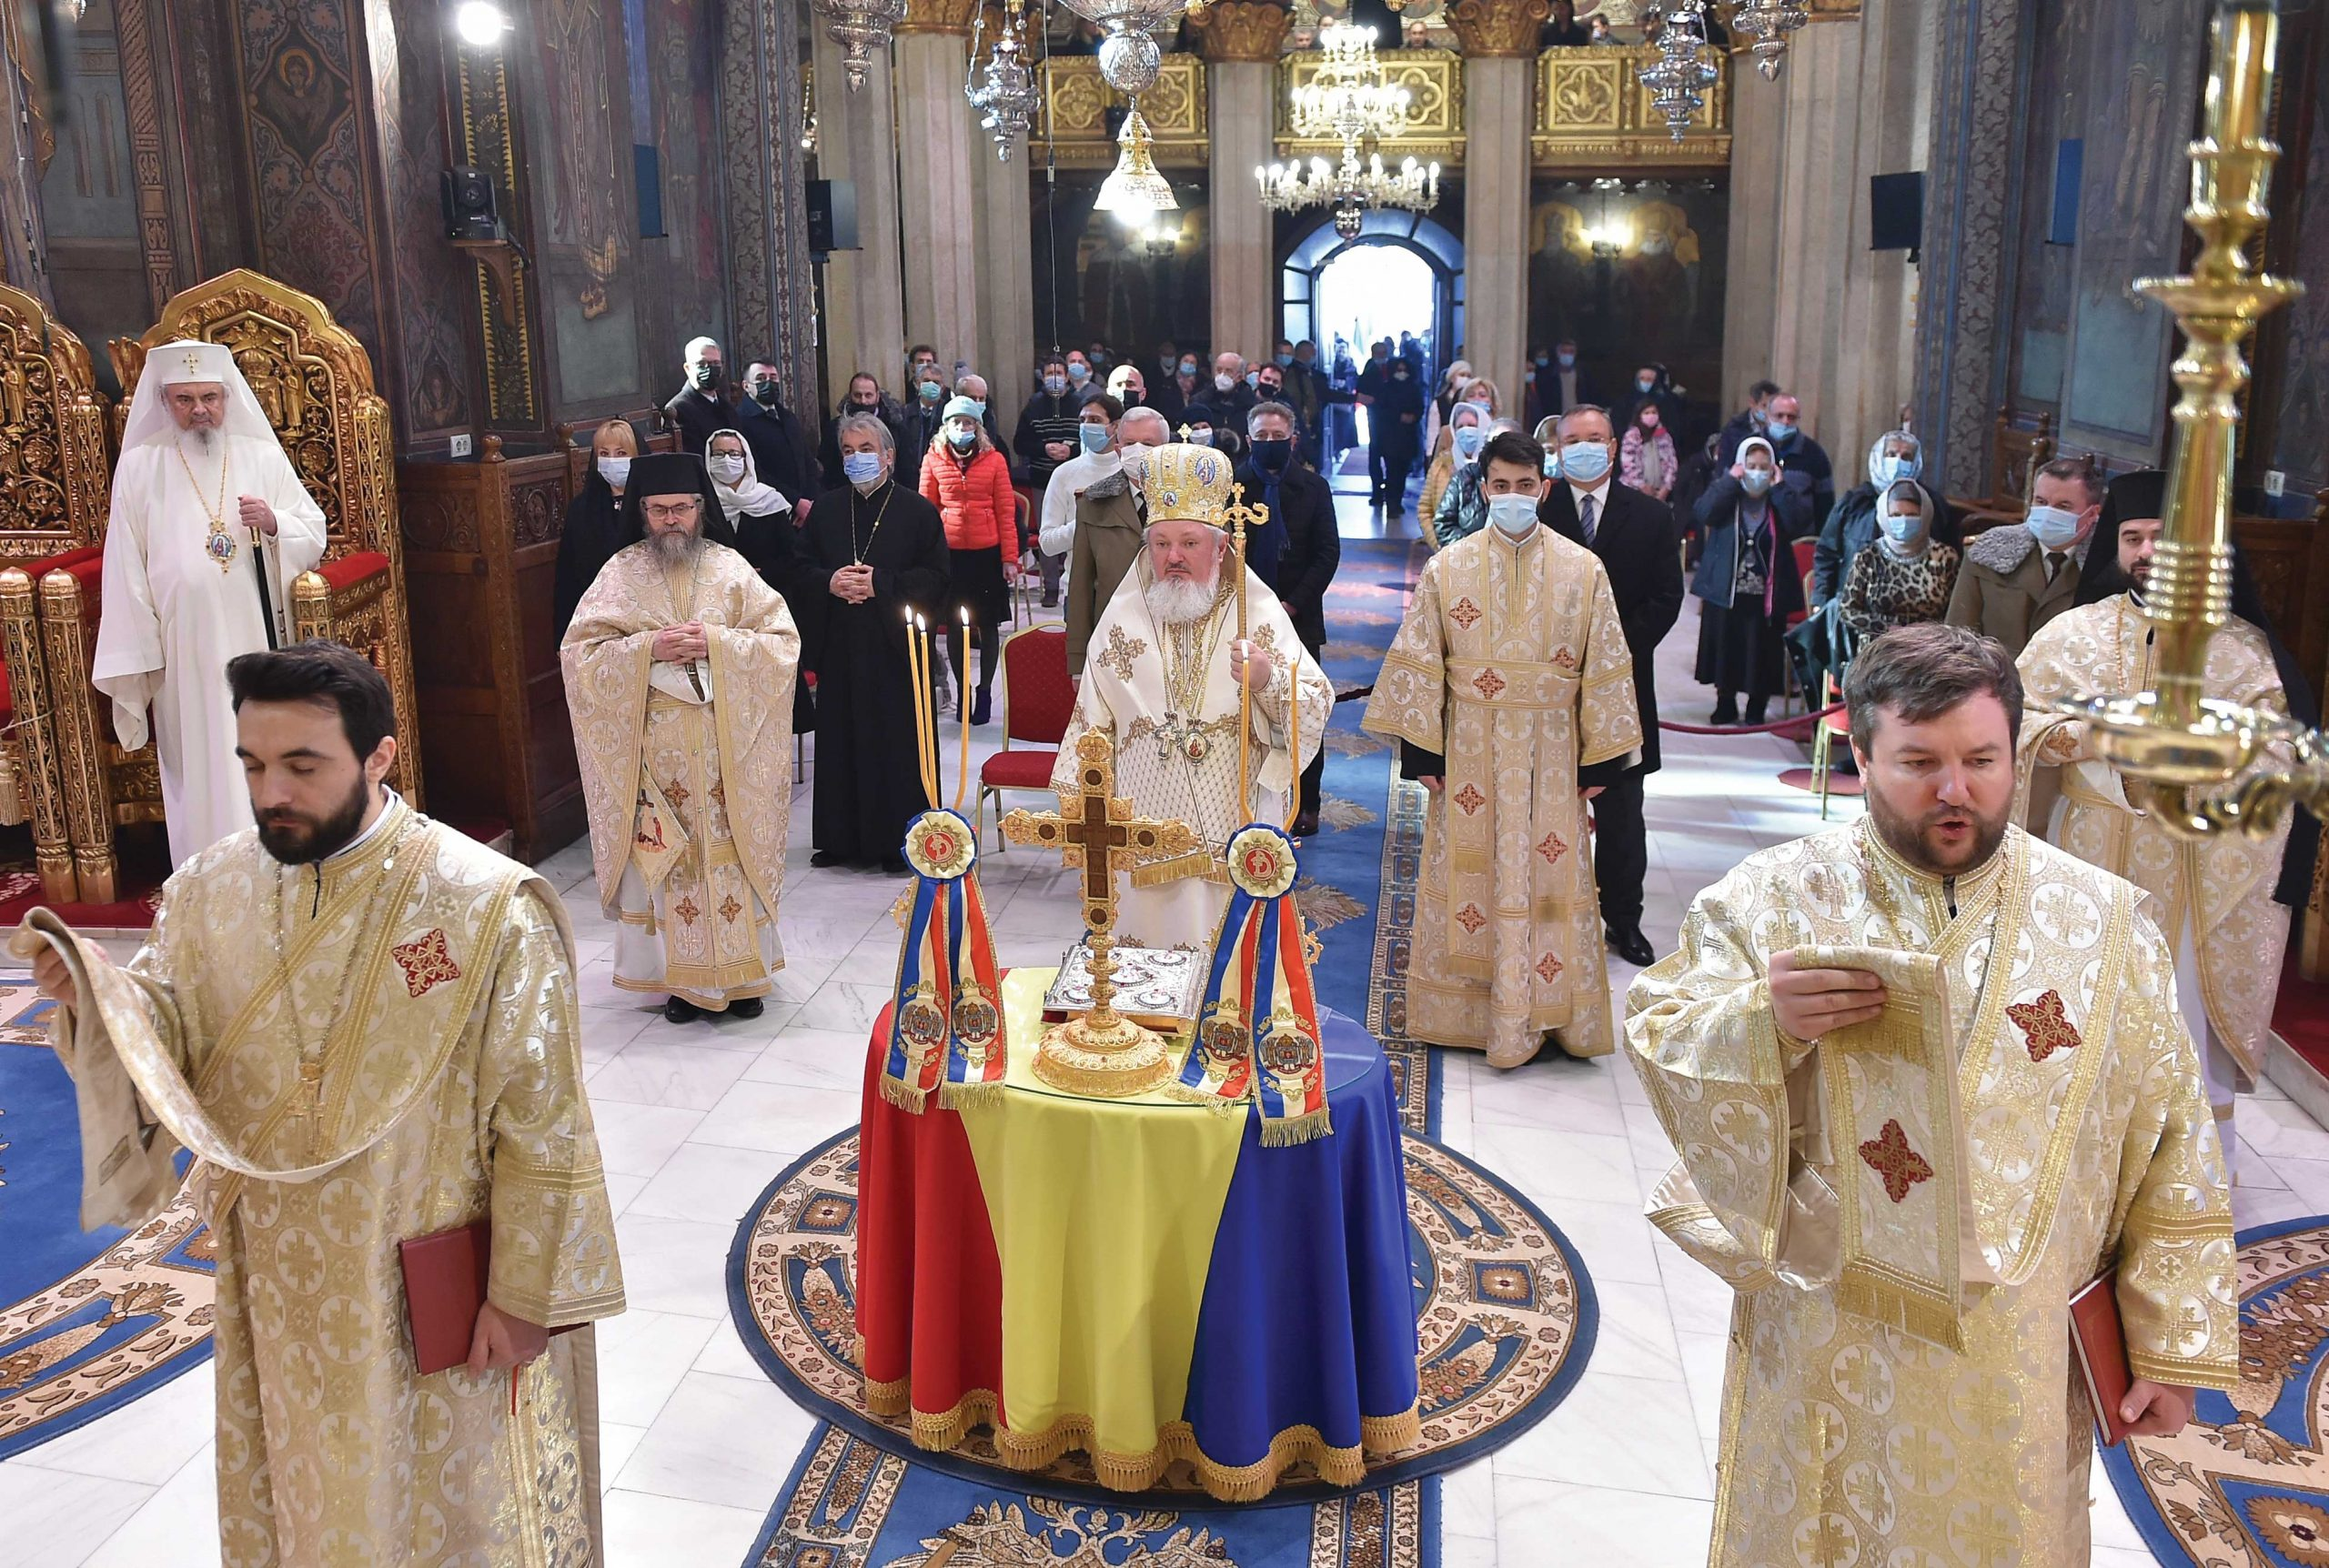 Aniversarea Unirii Principatelor Române la Catedrala Patriarhală